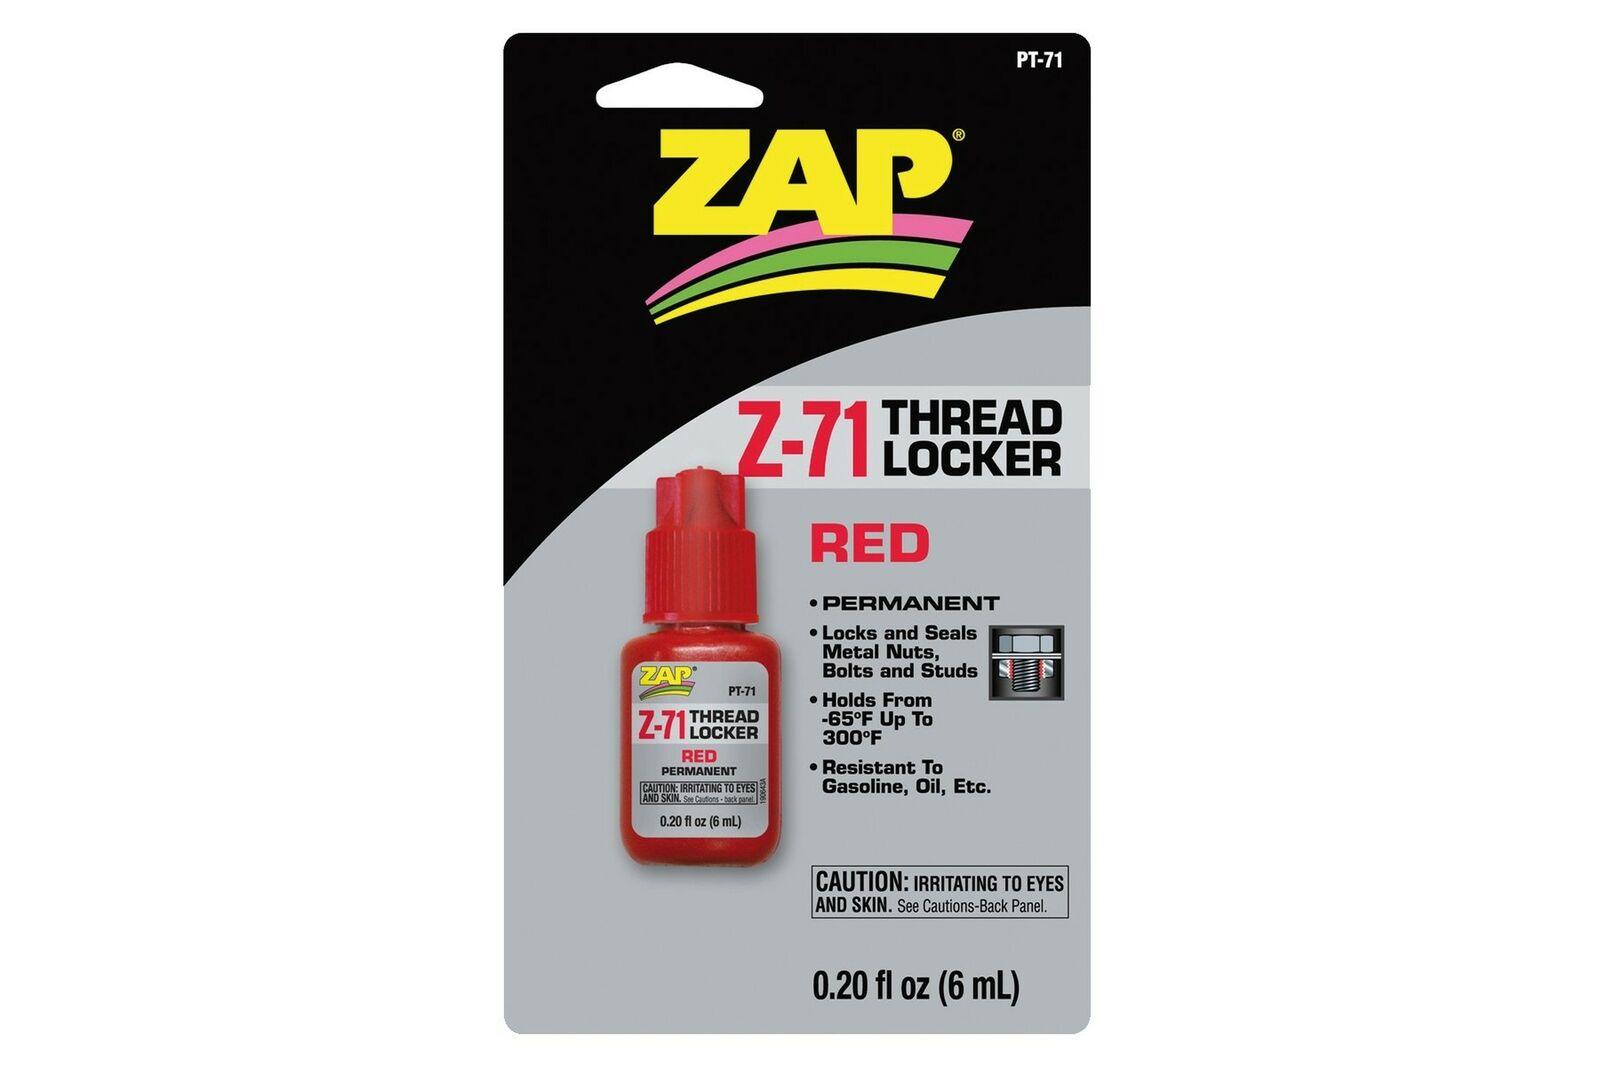 ZAP THREAD LOCKER PERMANENT 0.2OZ PT71